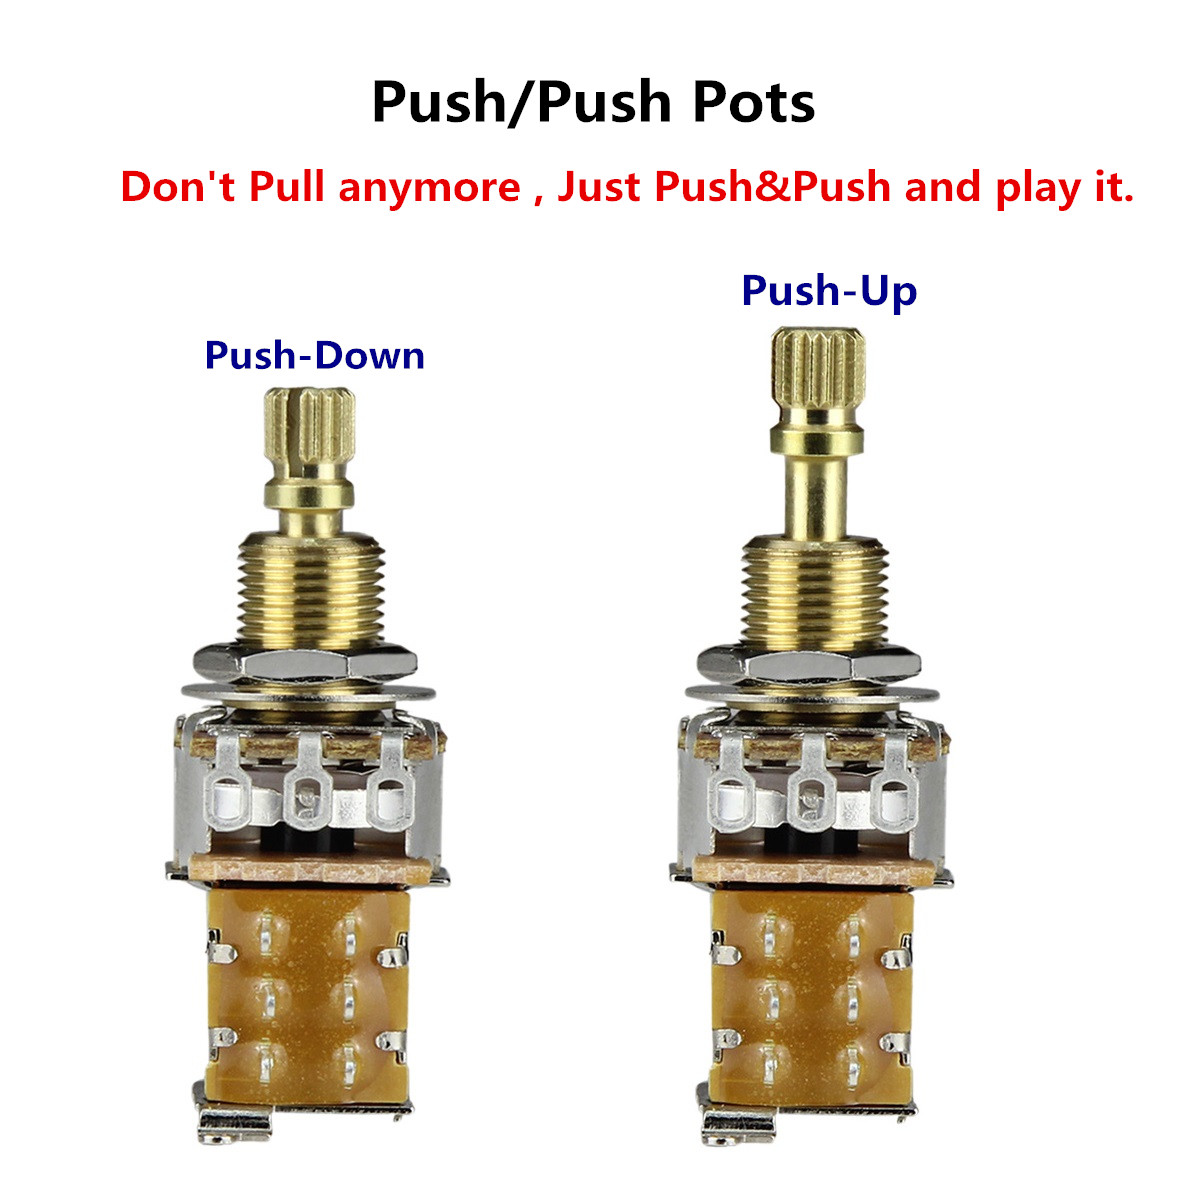 fleor 1pcs guitar potentiometer push push potentiometer a250k b250k a500k b500k copper long split shaft no pull anymore in guitar parts accessories  [ 1200 x 1200 Pixel ]